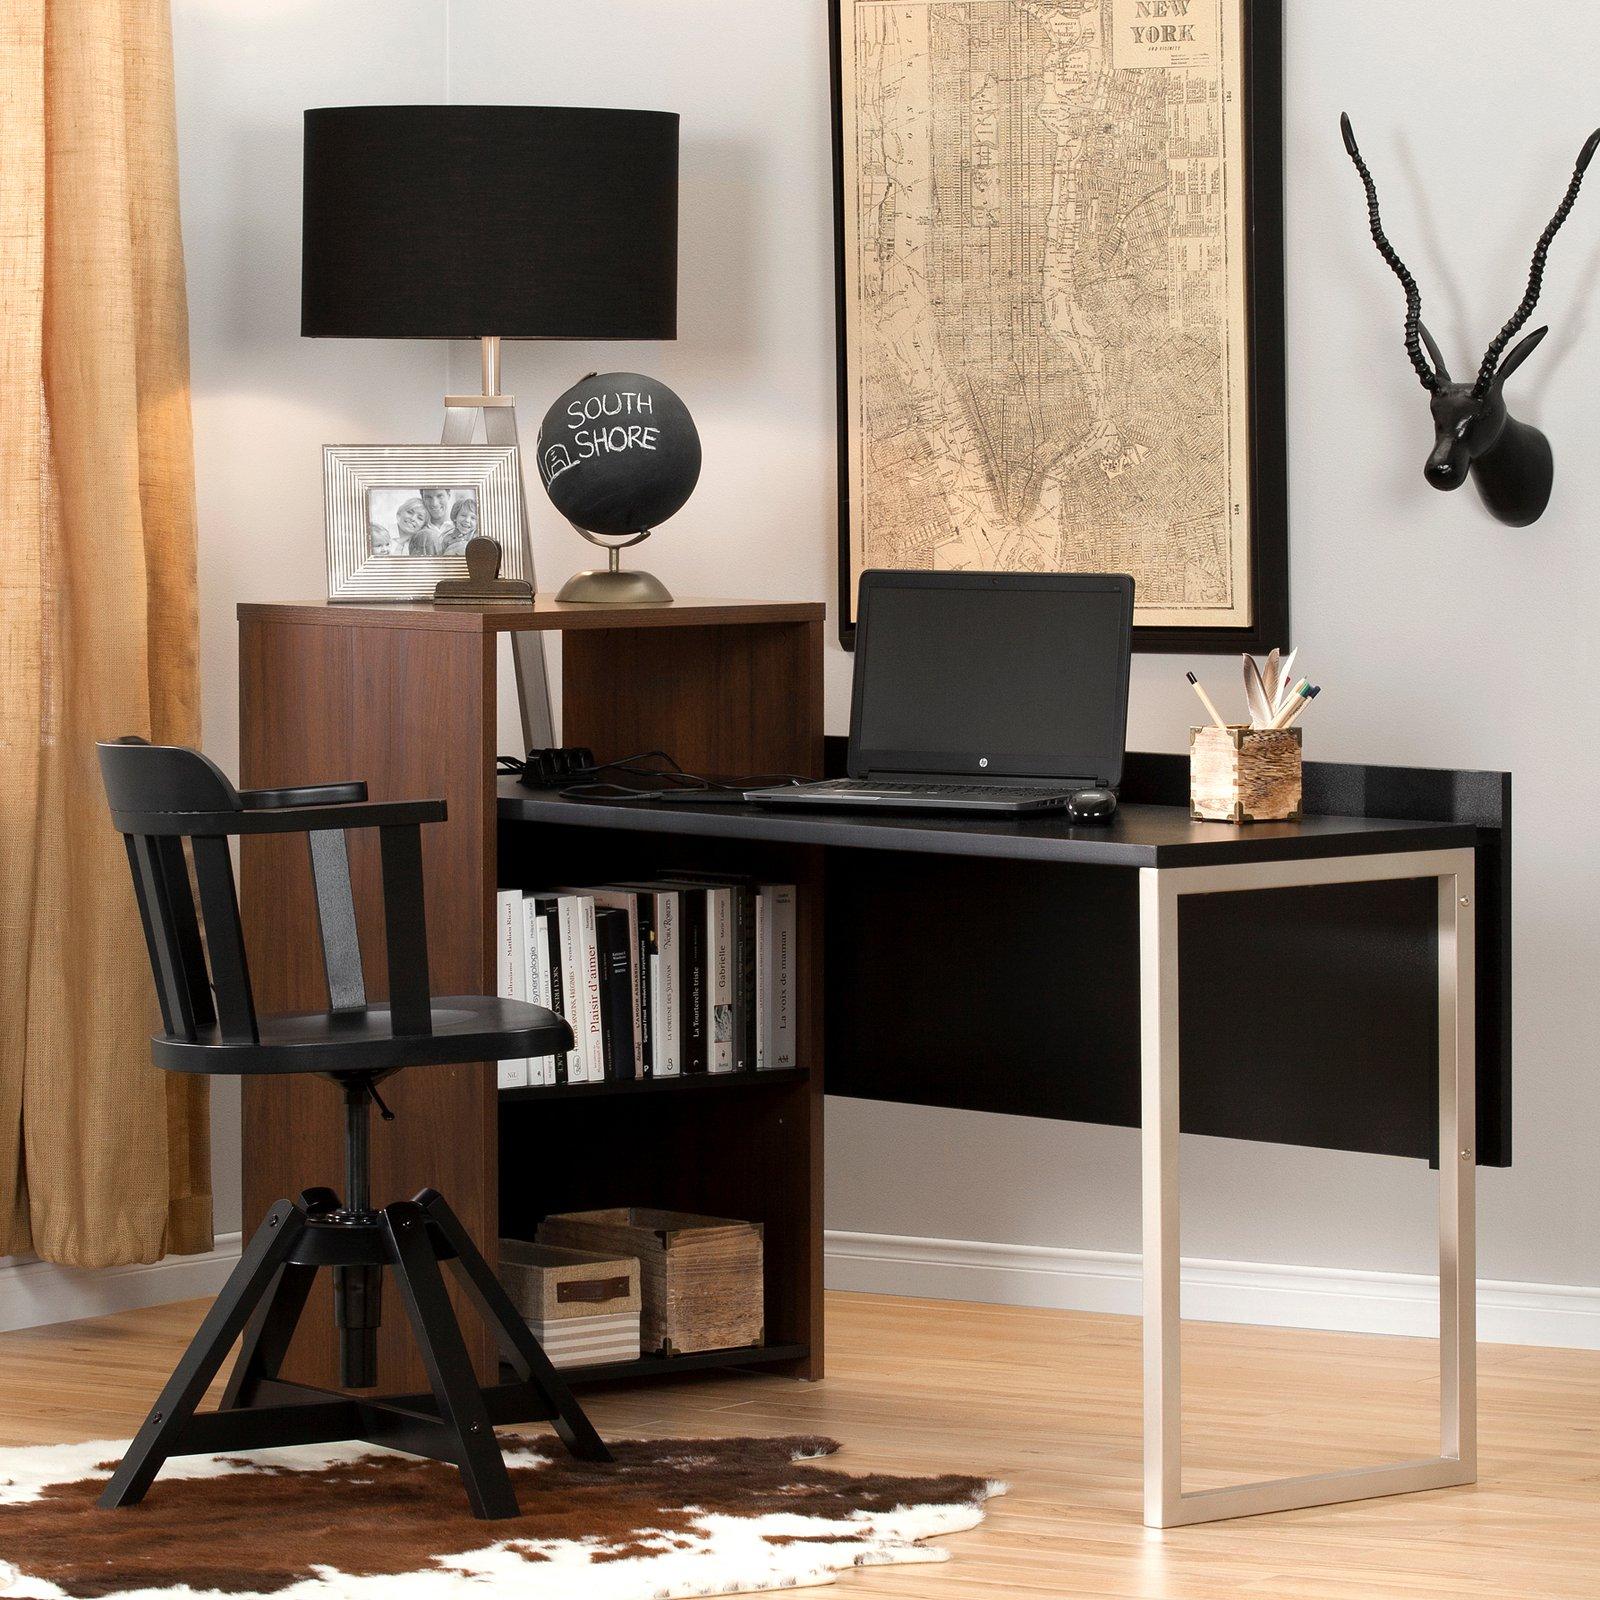 South Shore Tasko Desk with Storage, Brown Walnut and Black